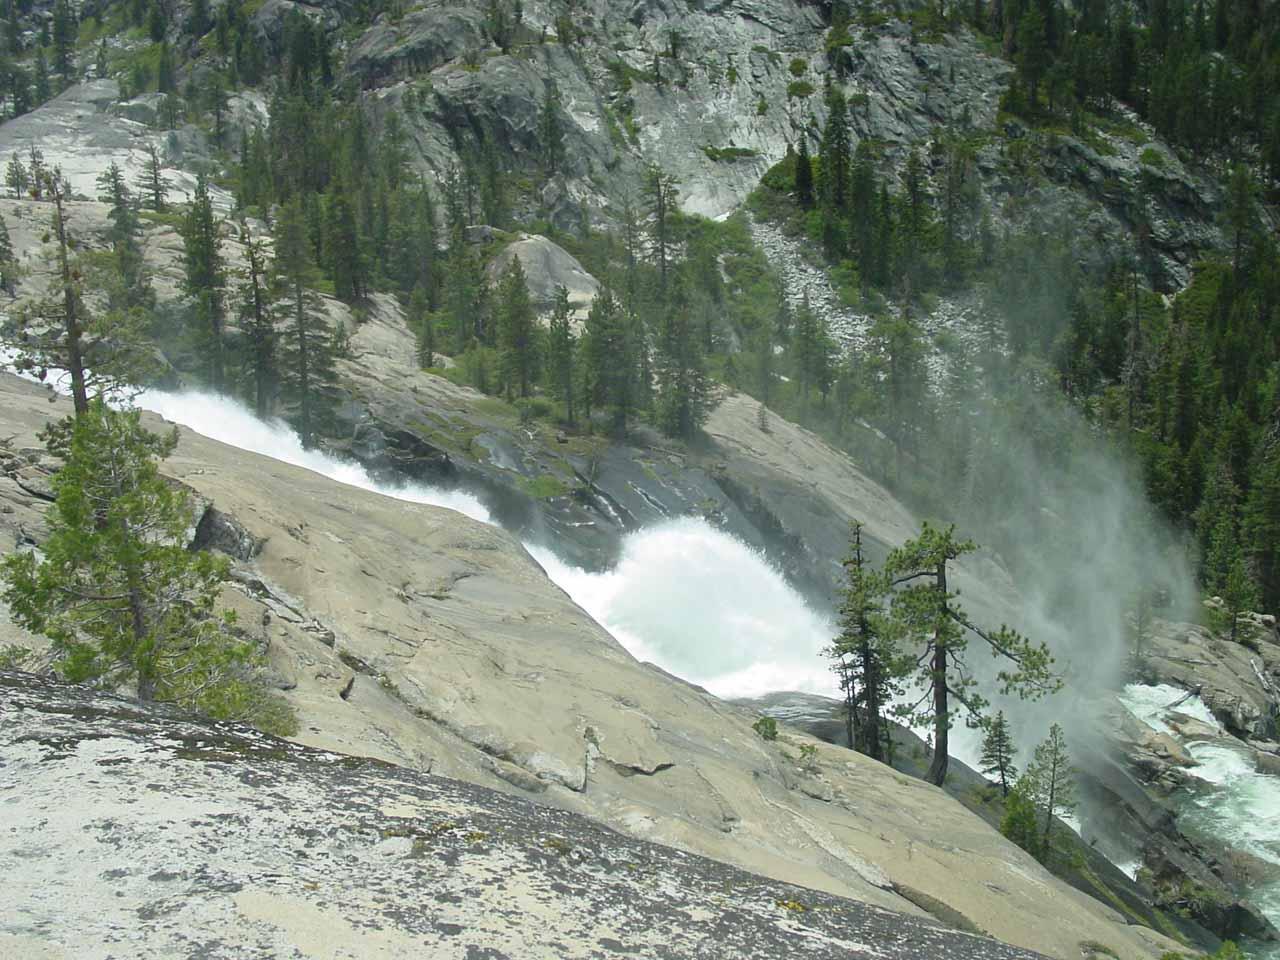 Looking down at the big waterwheel of Waterwheel Falls